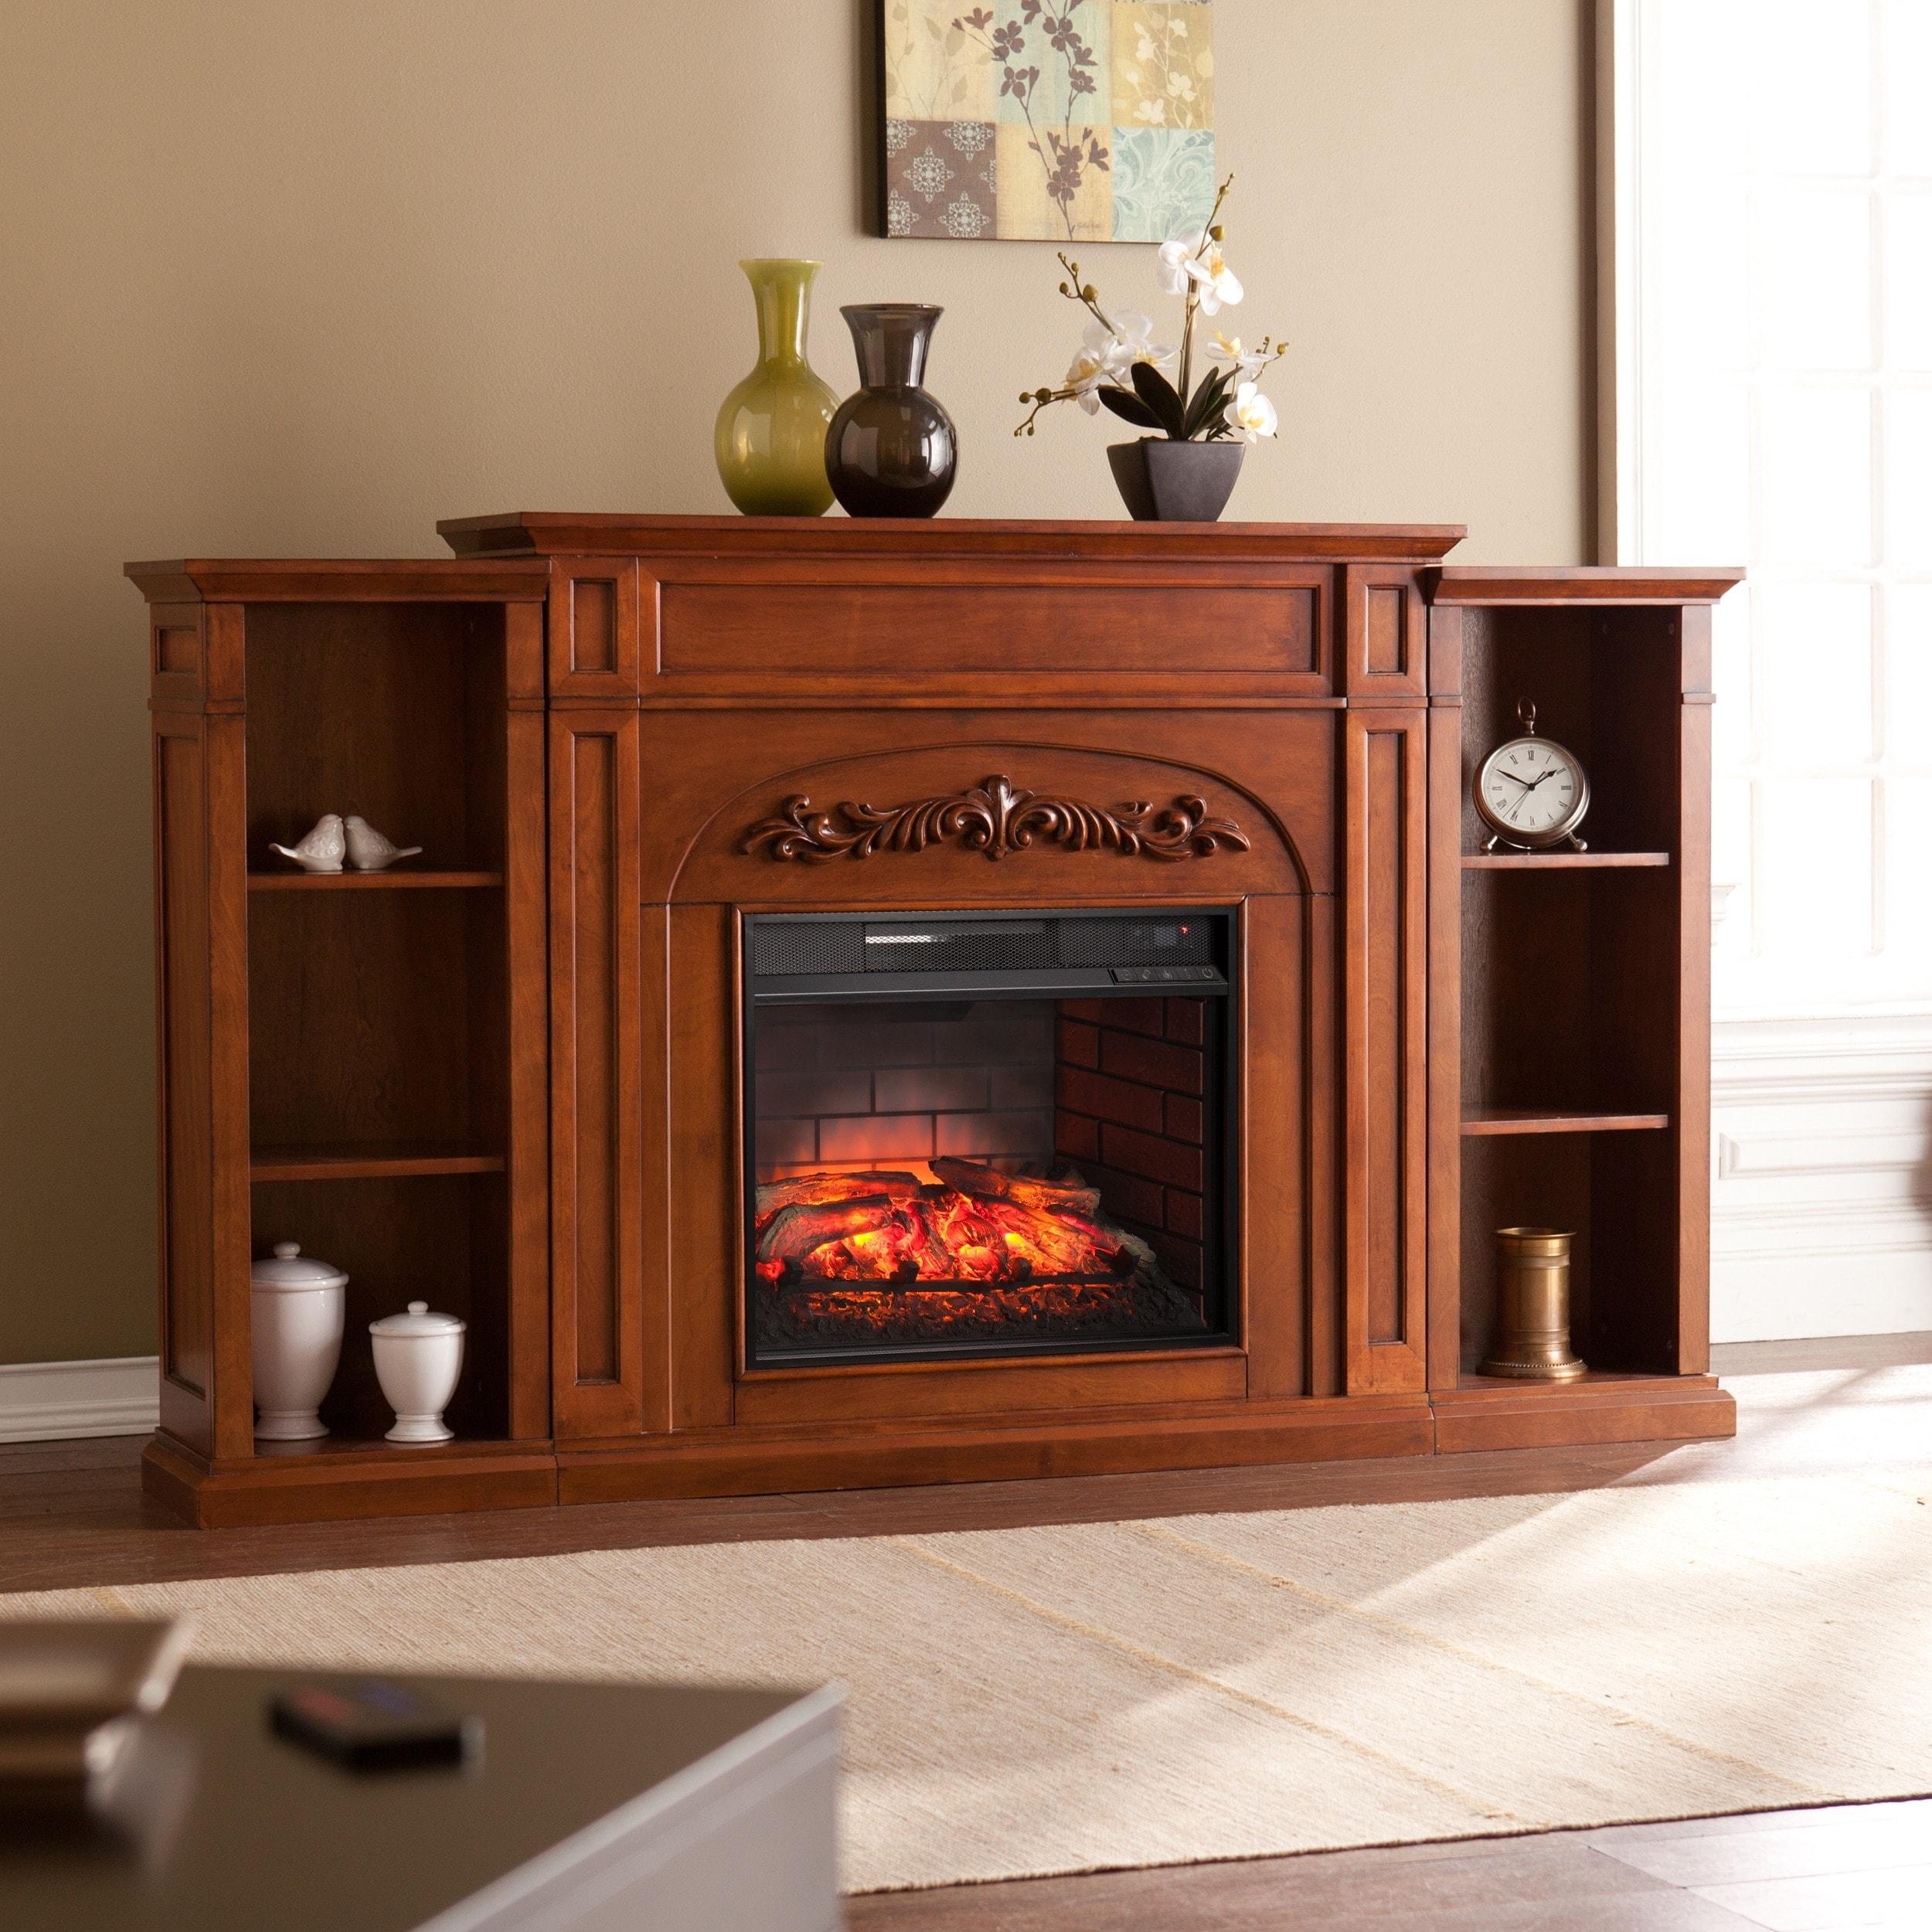 harper blvd oxley autumn oak bookcase infrared electric fireplace ebay. Black Bedroom Furniture Sets. Home Design Ideas